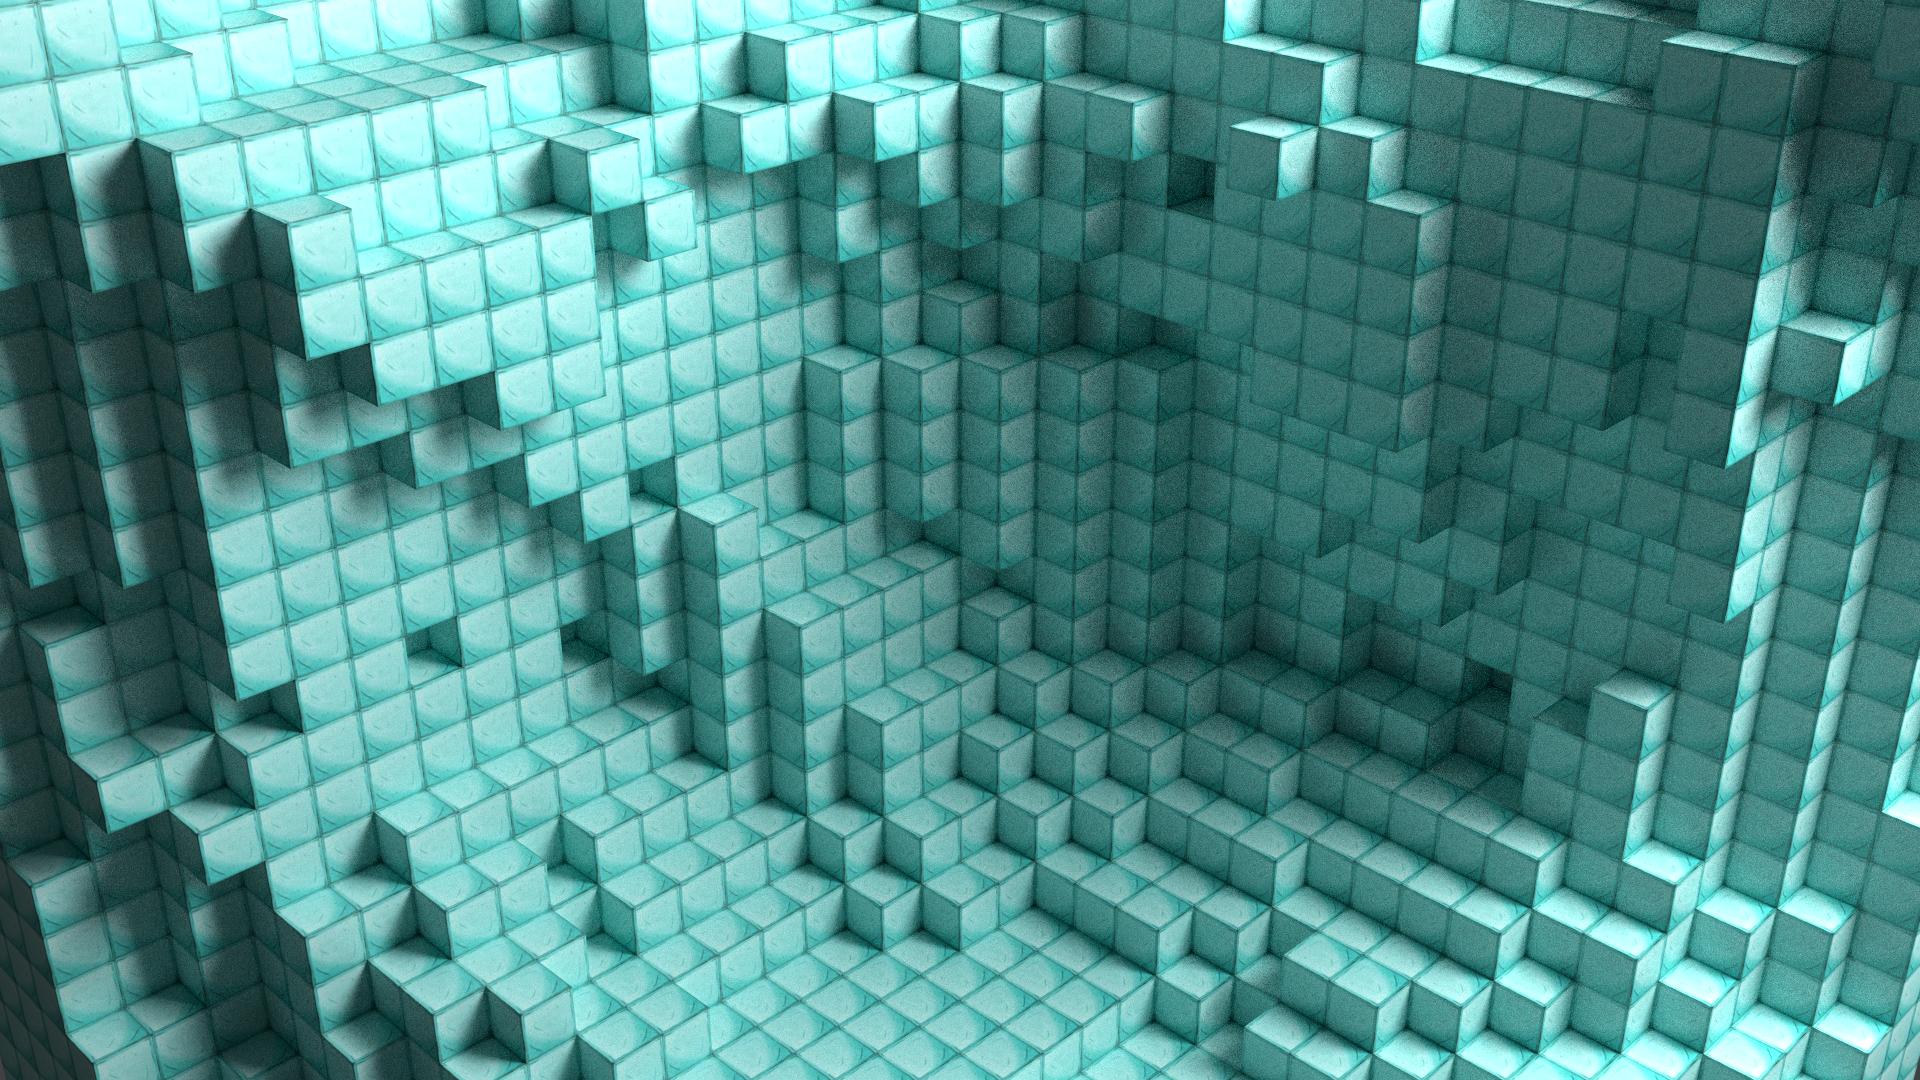 Minecraft Diamond Block Wallpaper Download